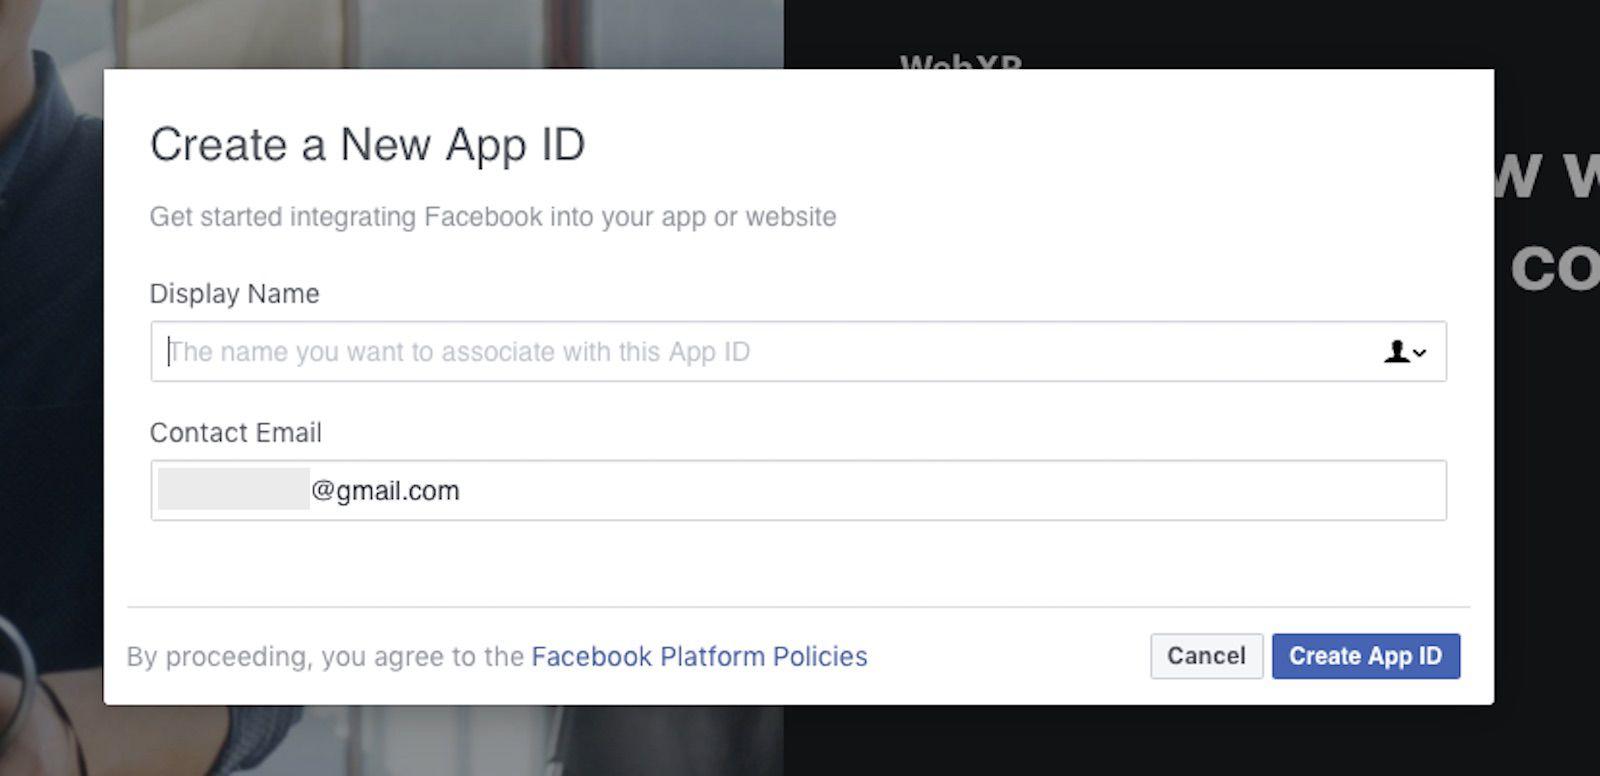 Creating new app ID